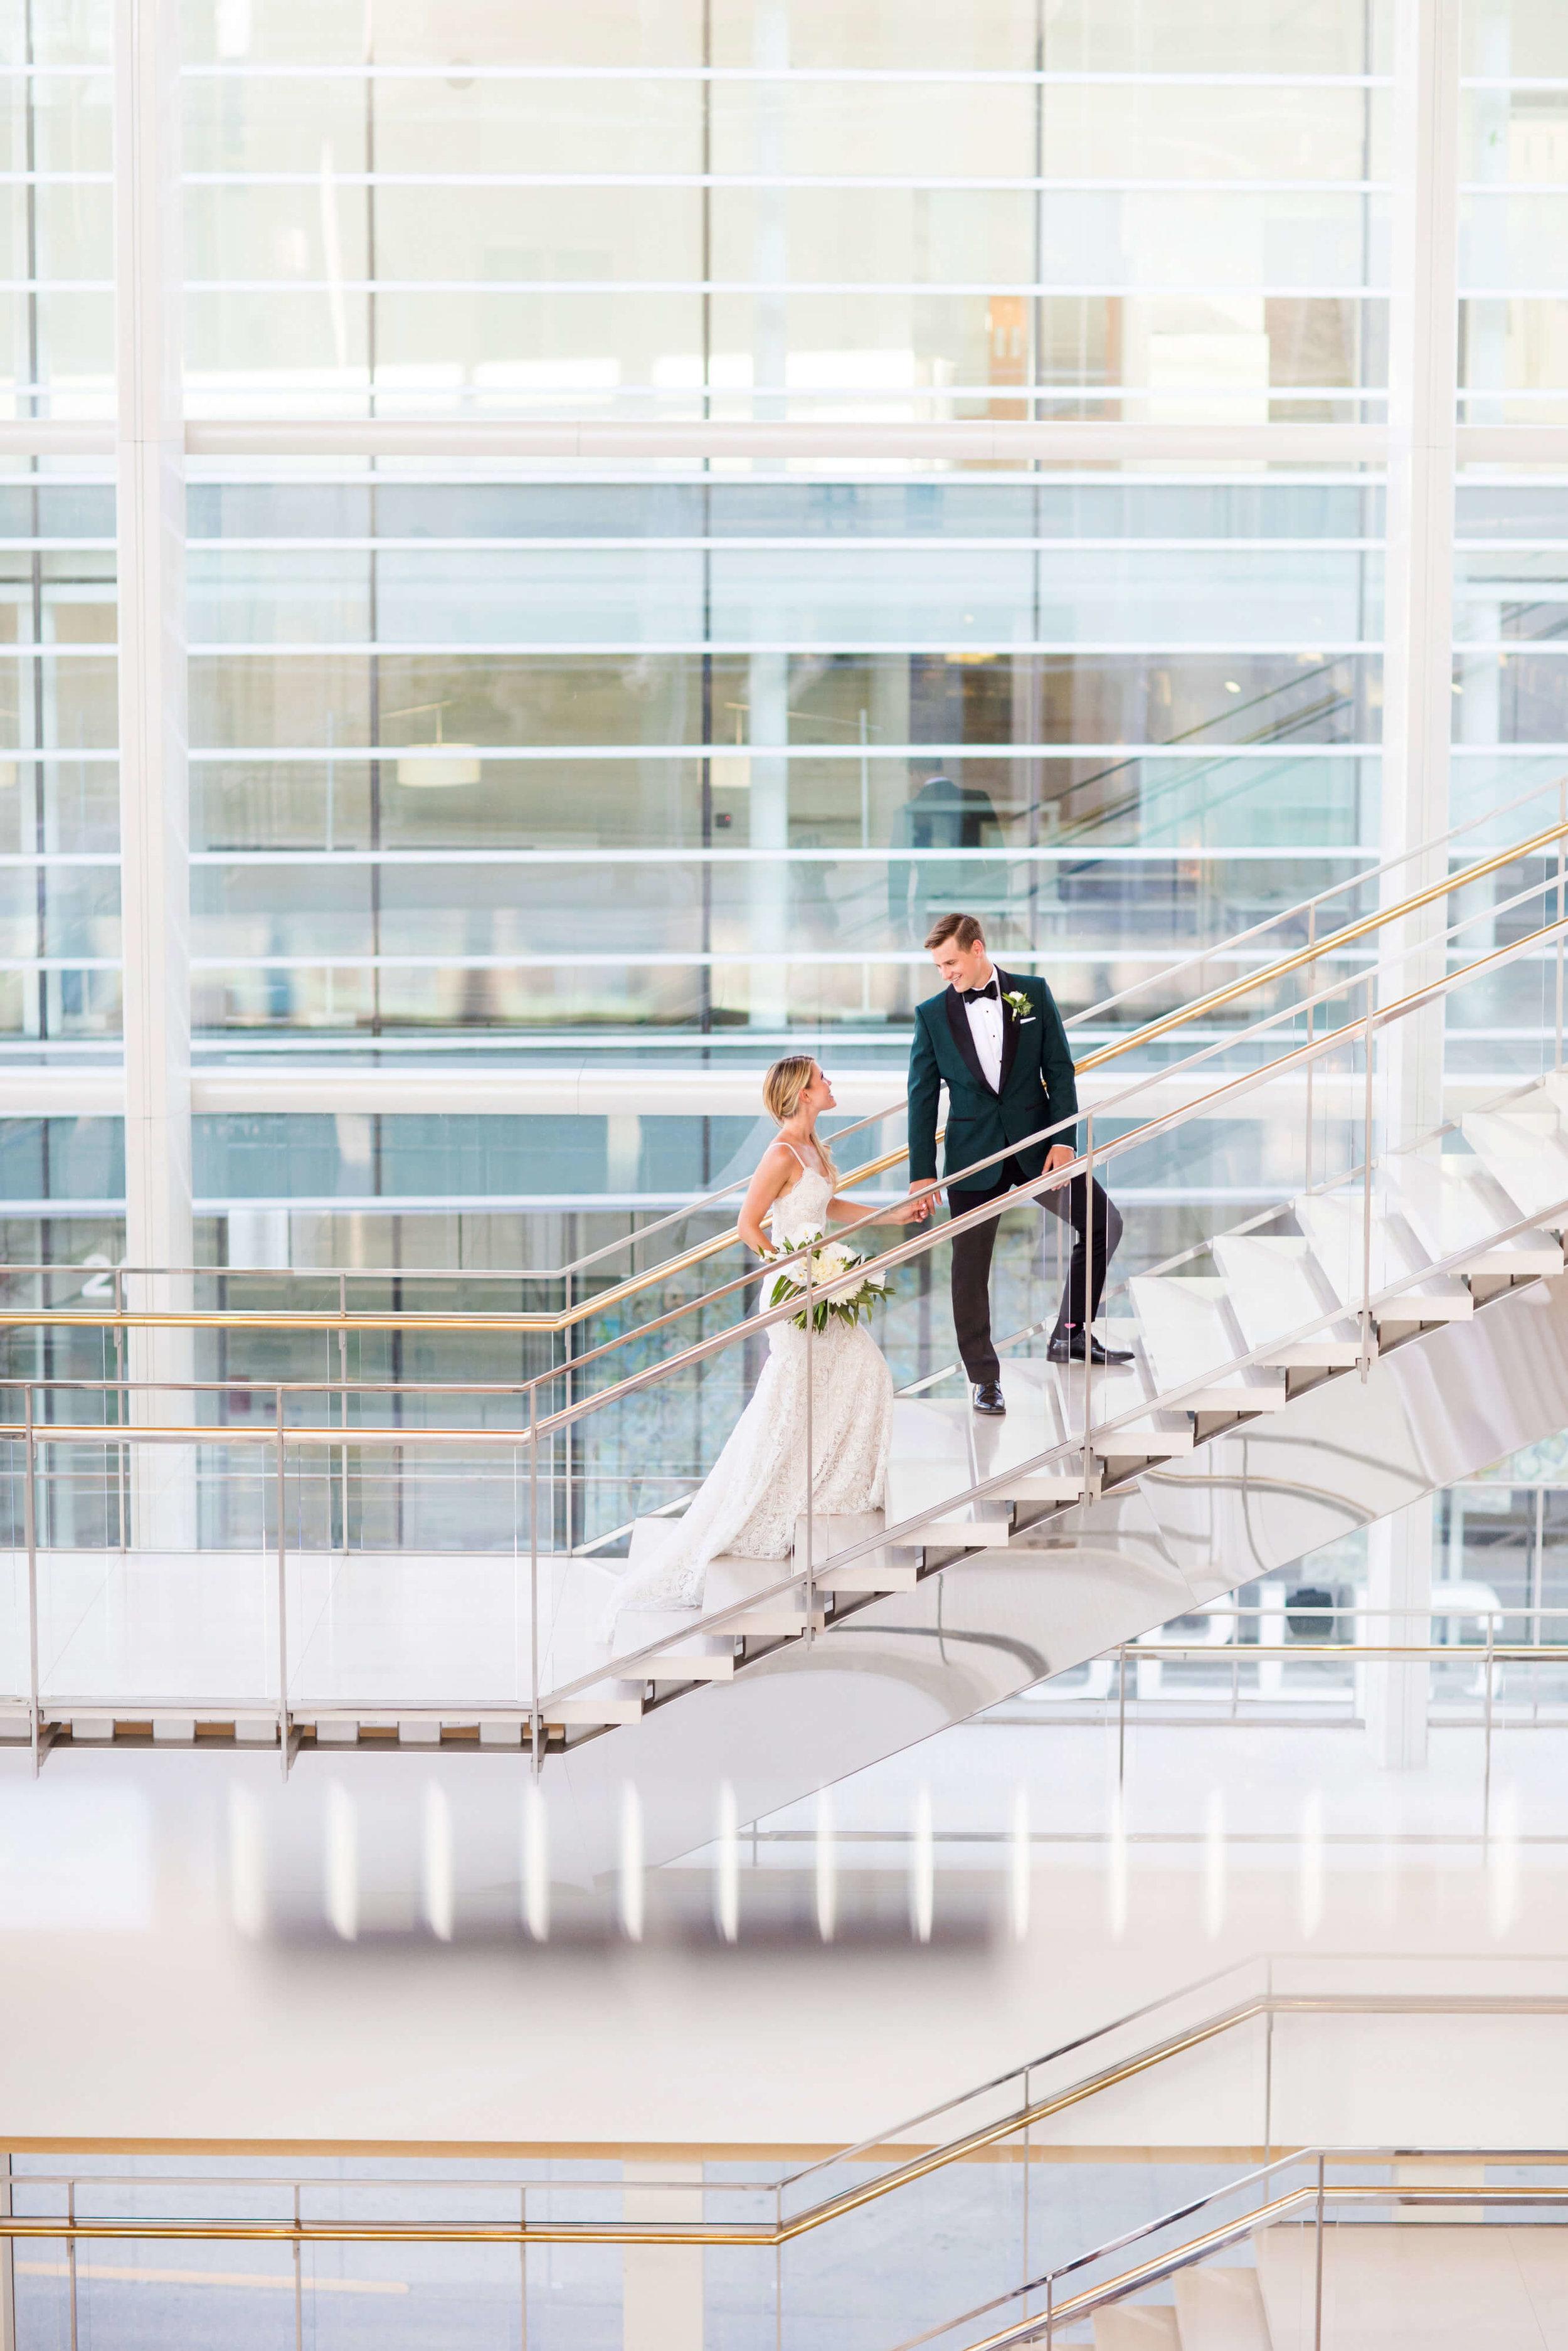 bride and groom walking up the stairs | Minnesota wedding photographer Studio KH wedding dress details | wedding blog | Sixpence Events 70 Ways to Photograph Your Wedding Dress.jpg